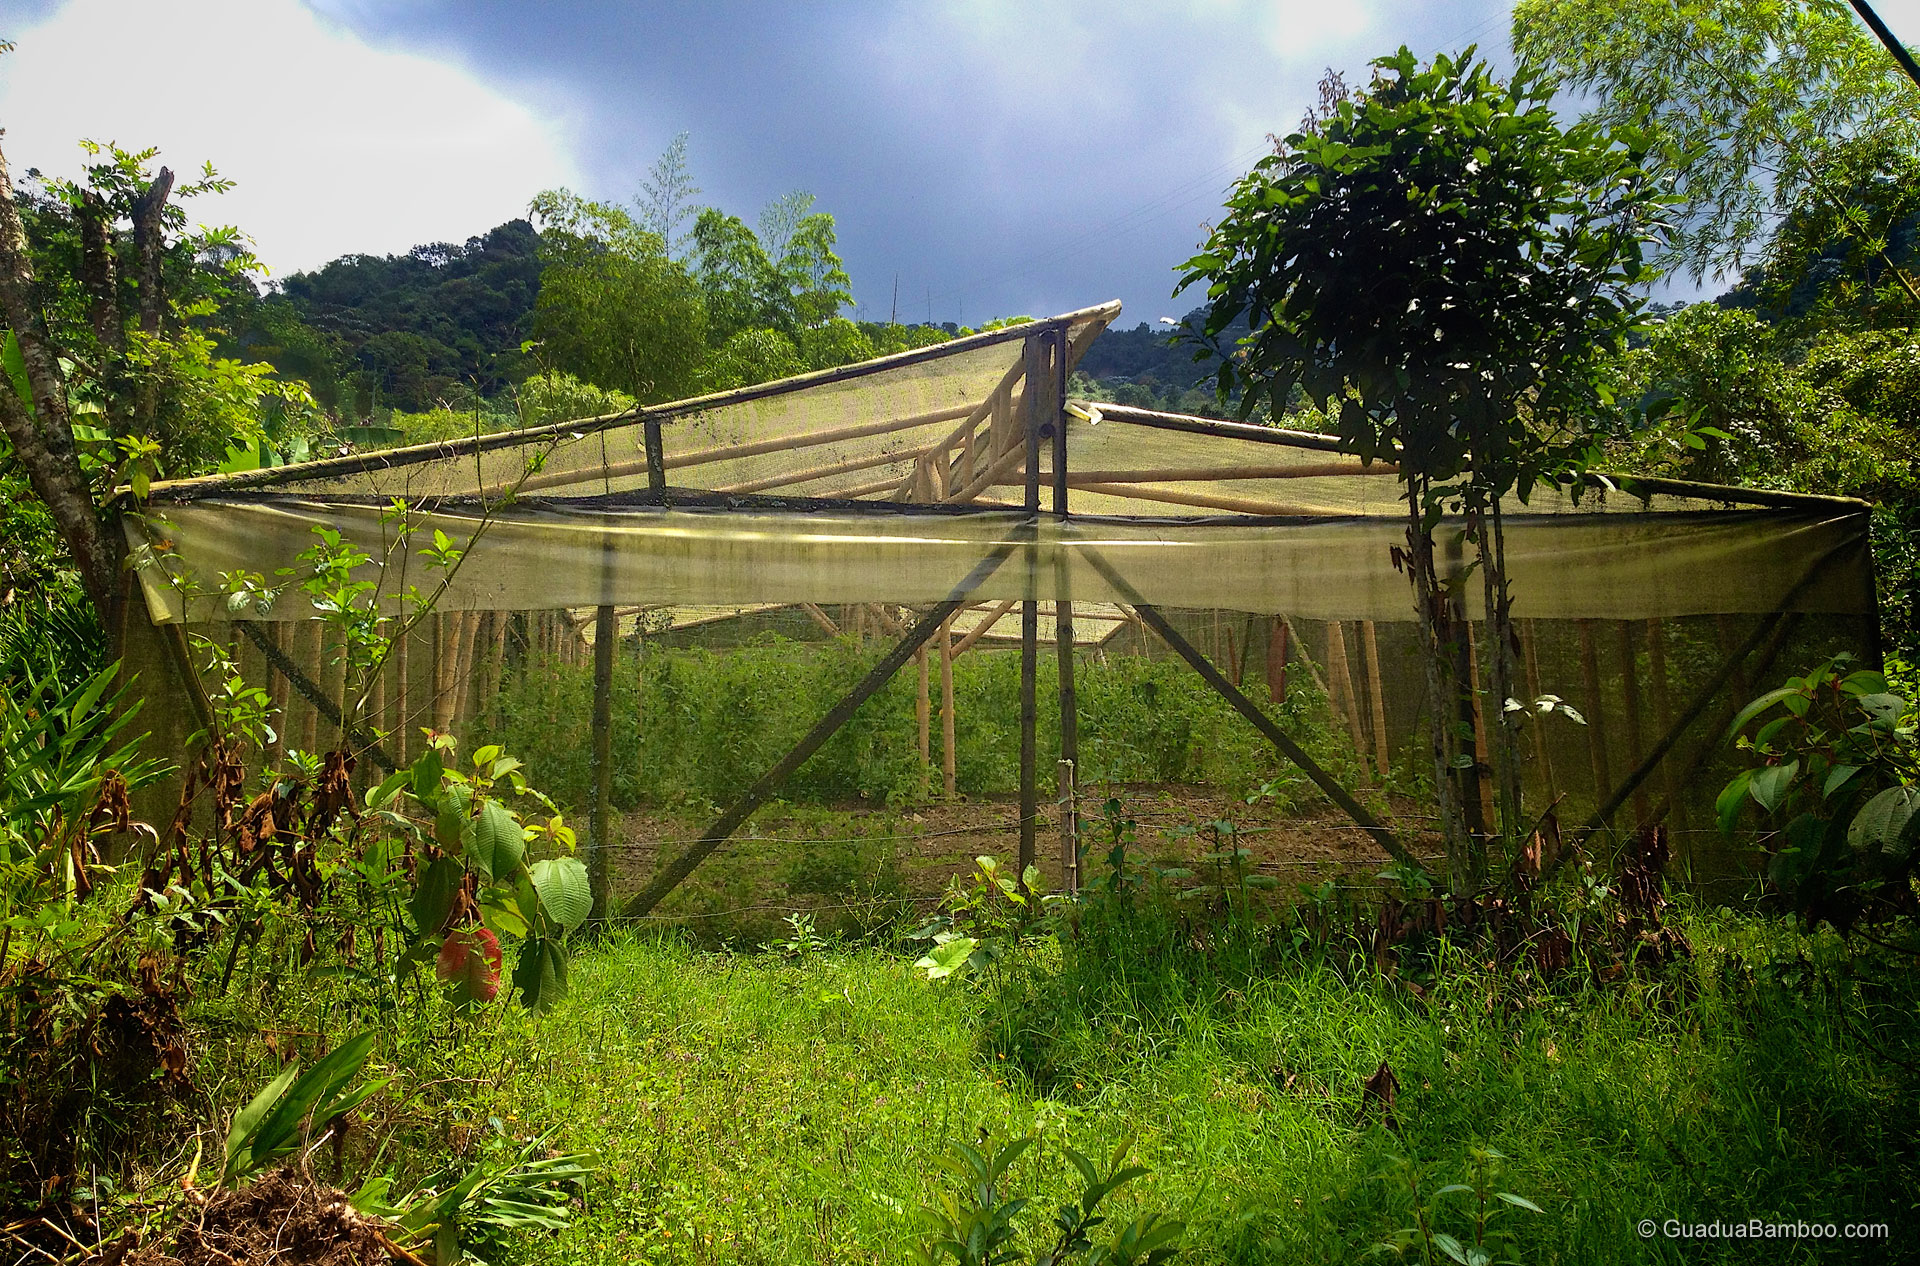 Guadua Bamboo Greenhouse